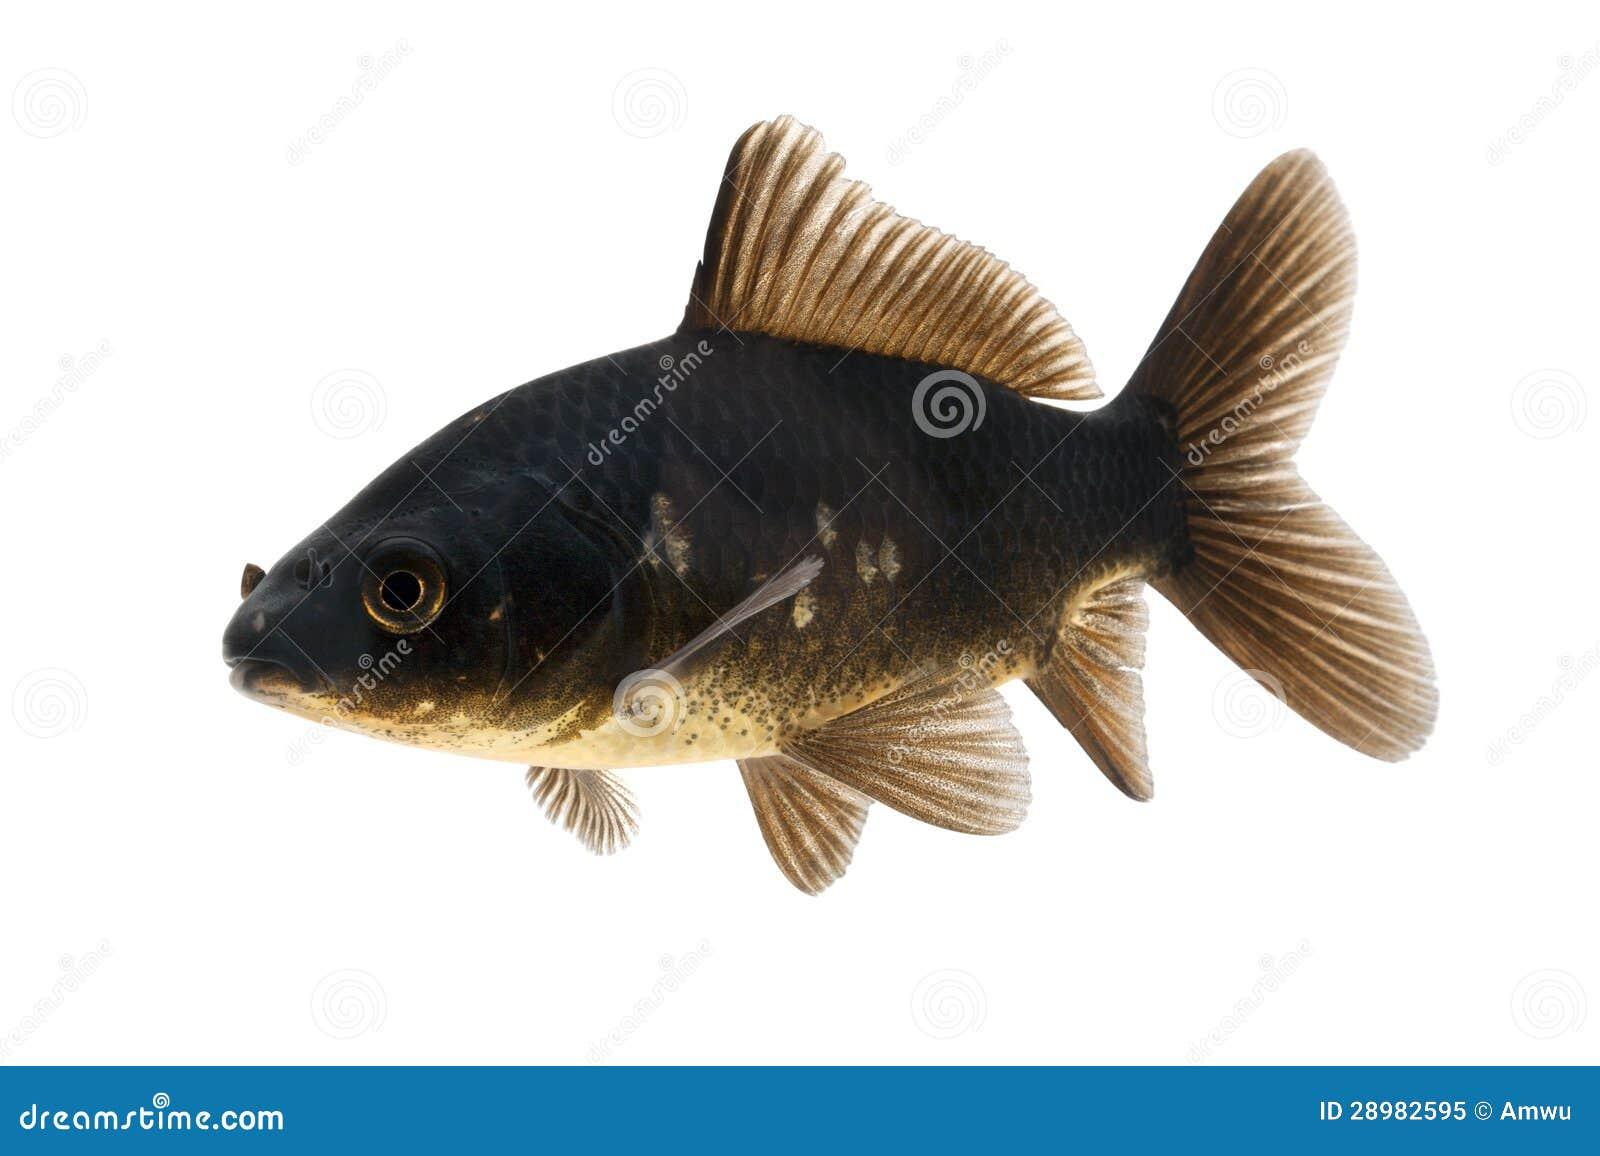 Black koi fish stock image image of domestic freshness for Black koi fish